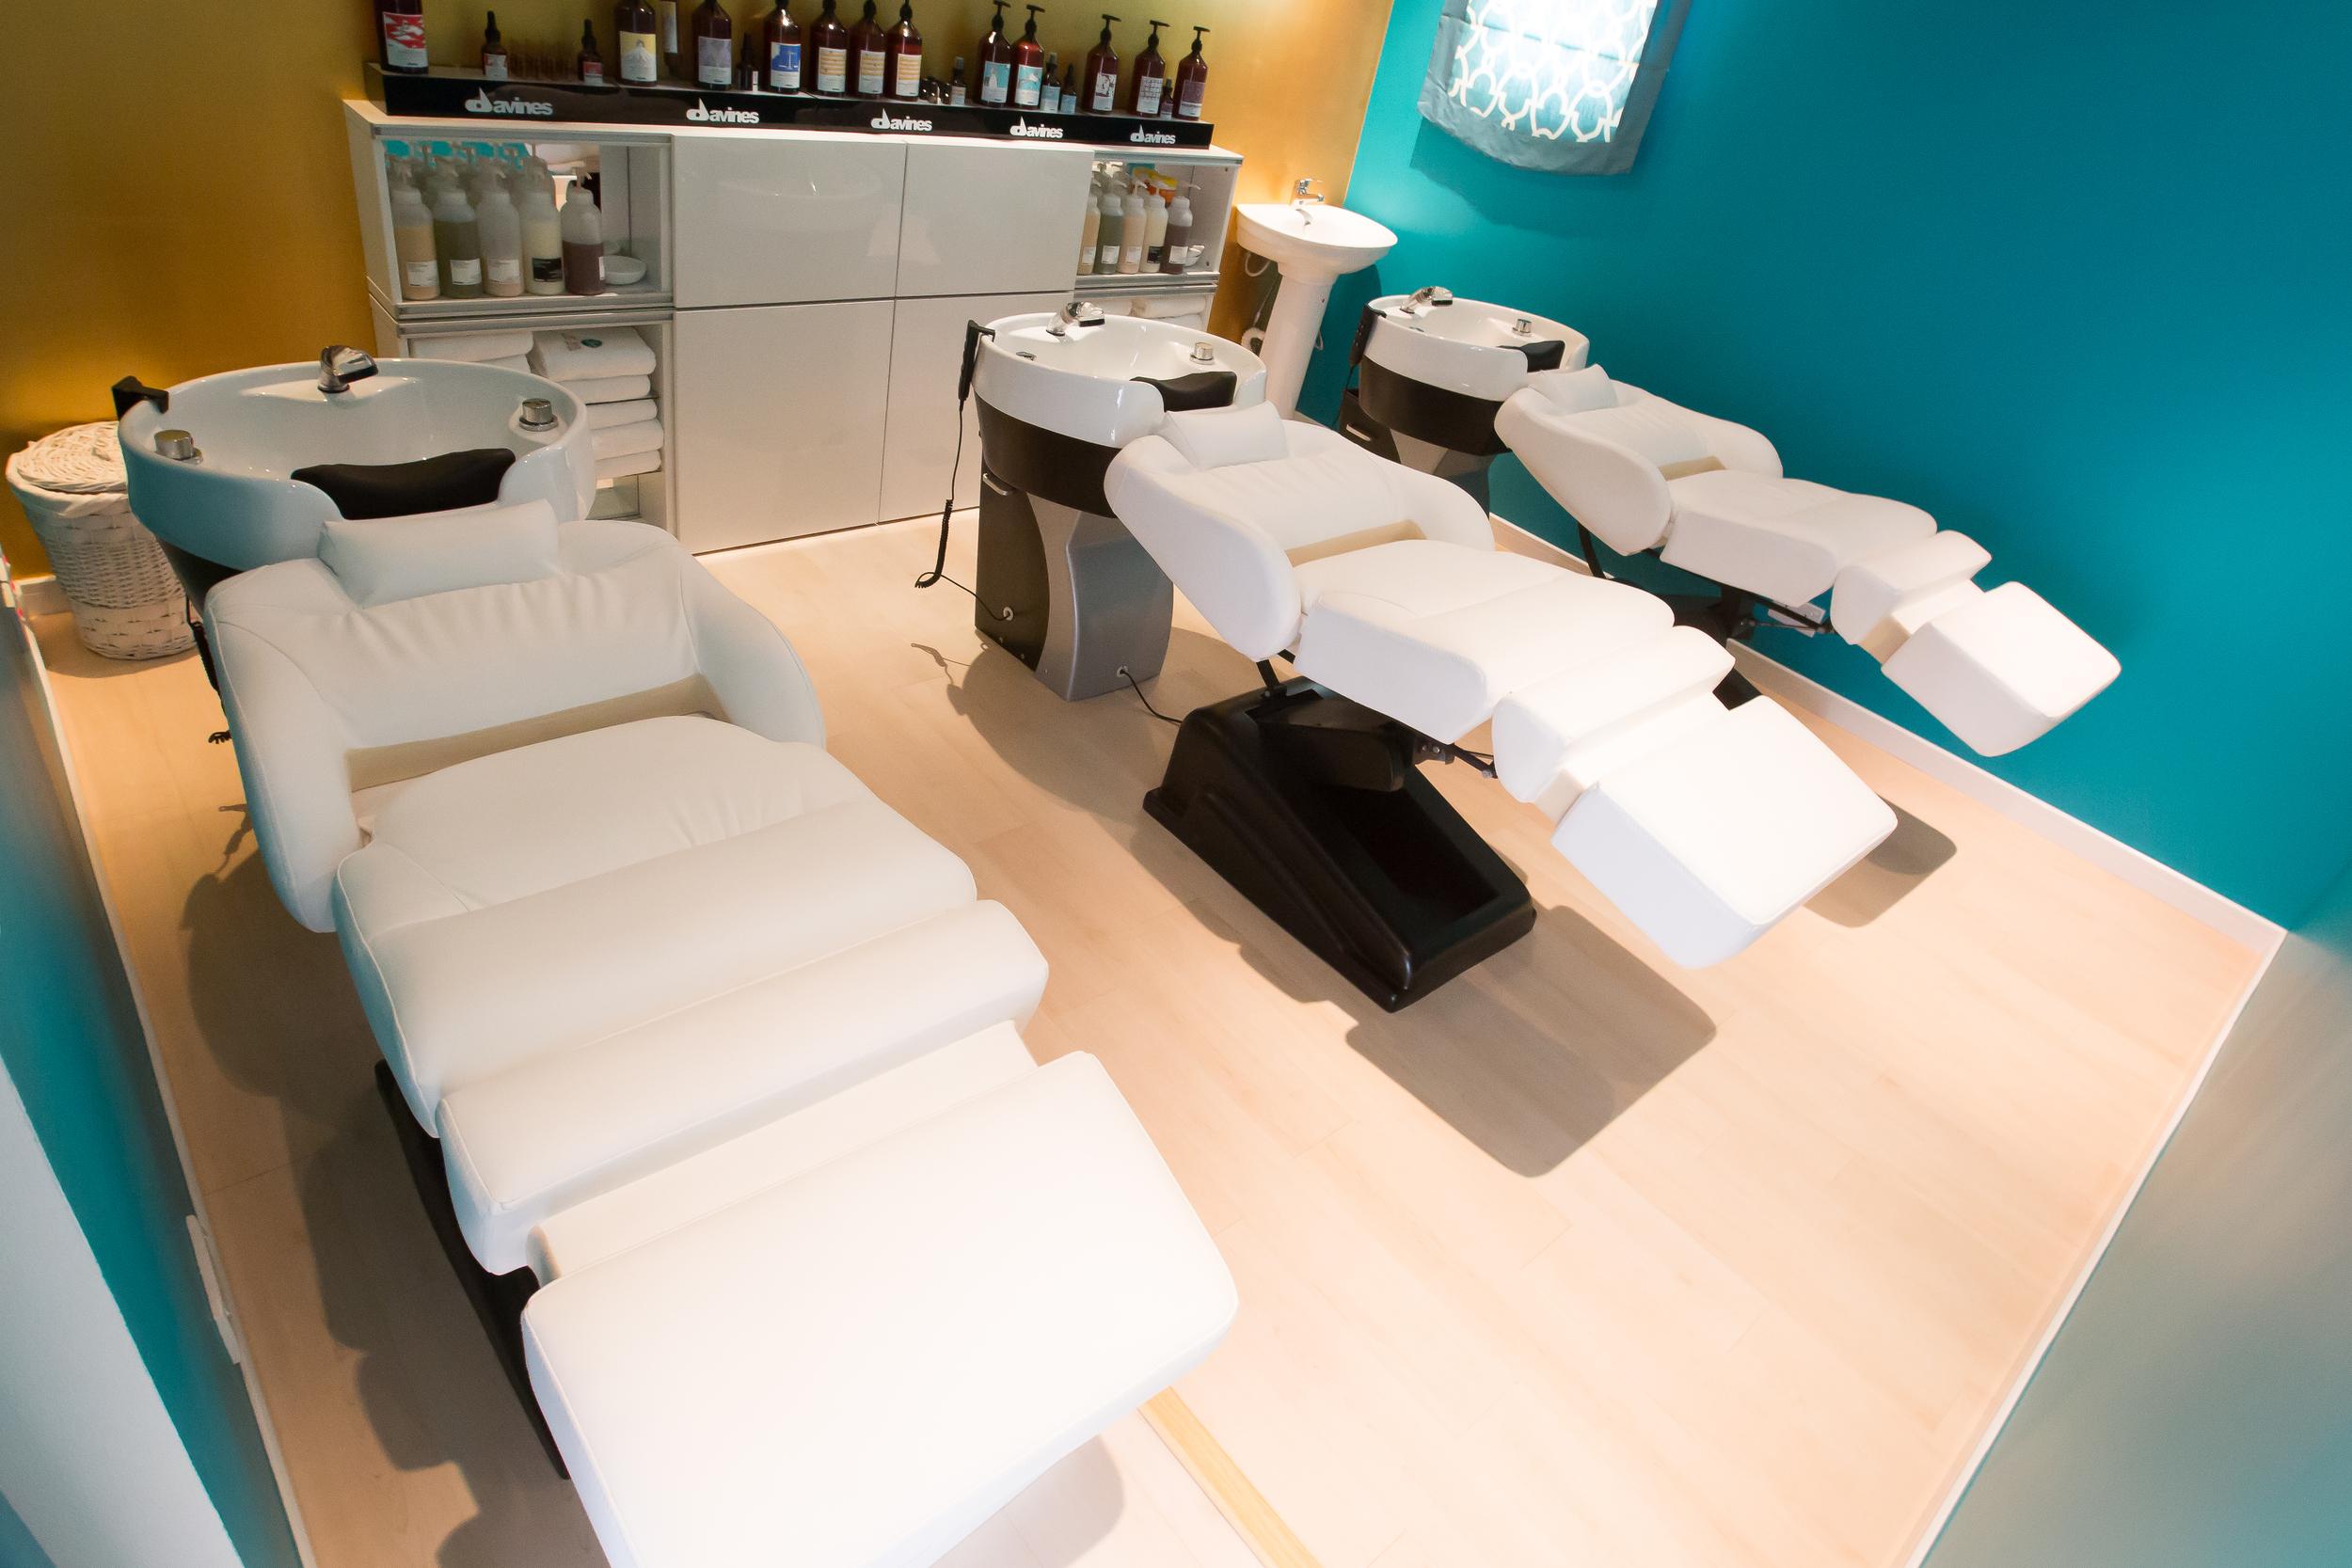 Shampoo+chairs+reclined.JPG